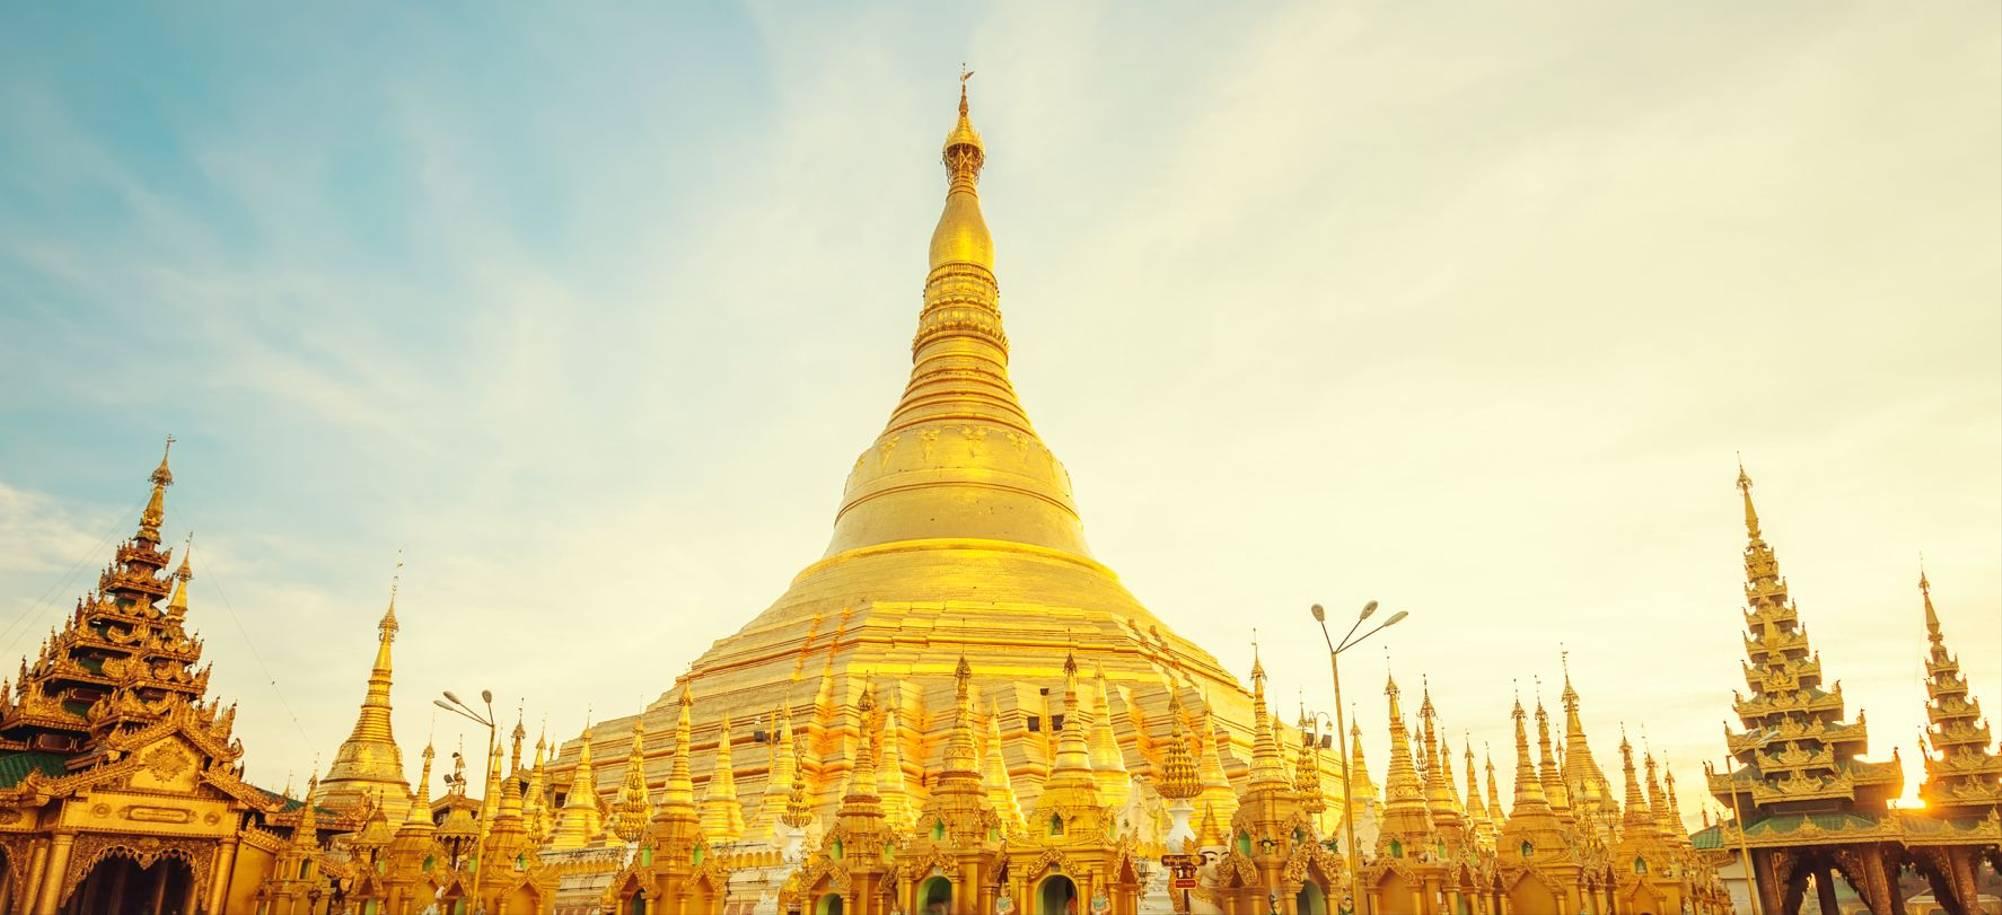 Yangon2   Shwedagon Paya   Itinerary Desktop